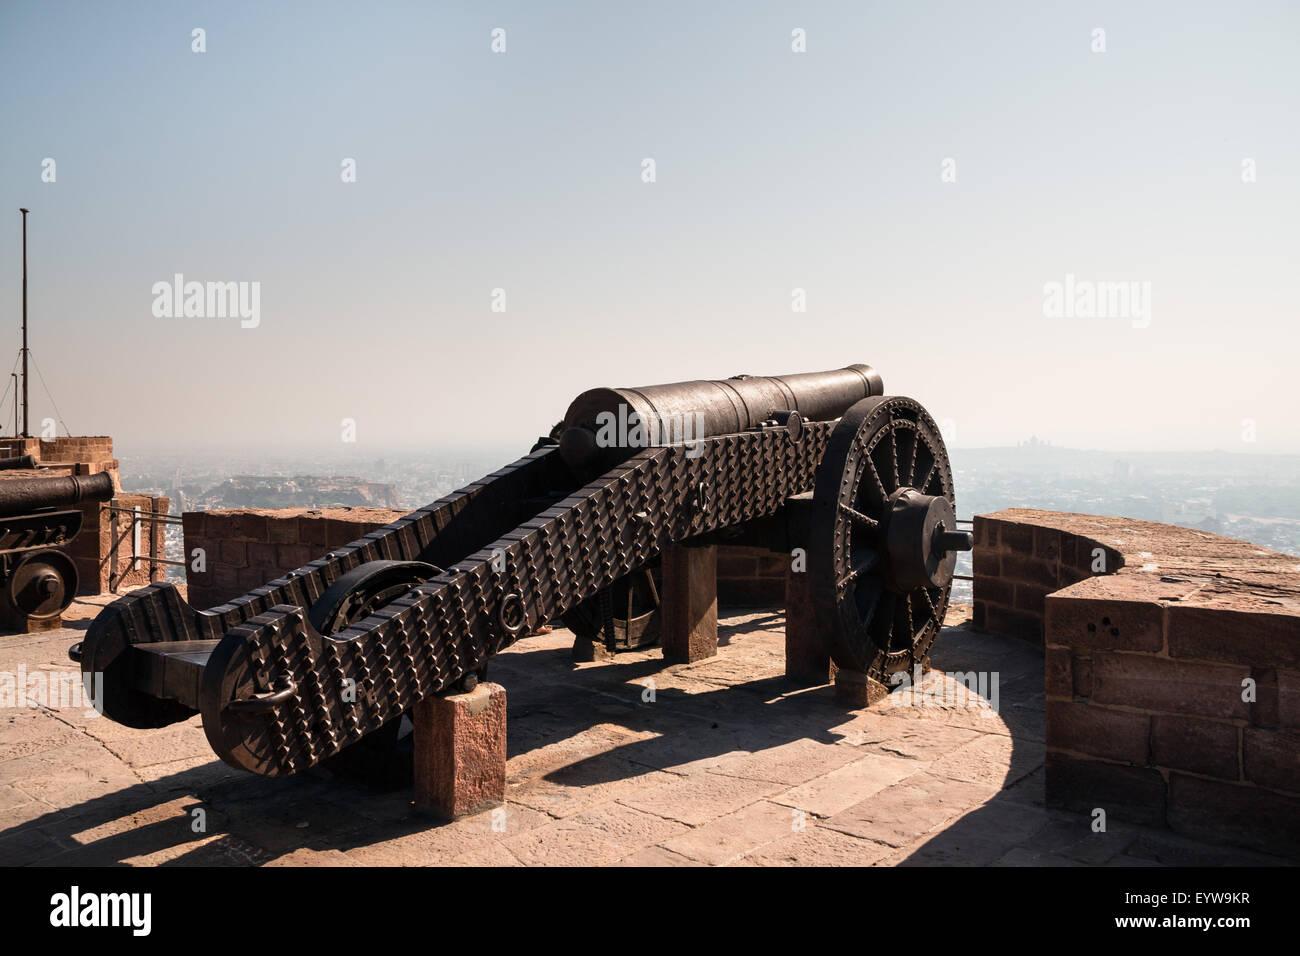 Cannon on the battlements of the Mehrangarh Fort, Meherangarh, Jodhpur, Rajasthan, India - Stock Image